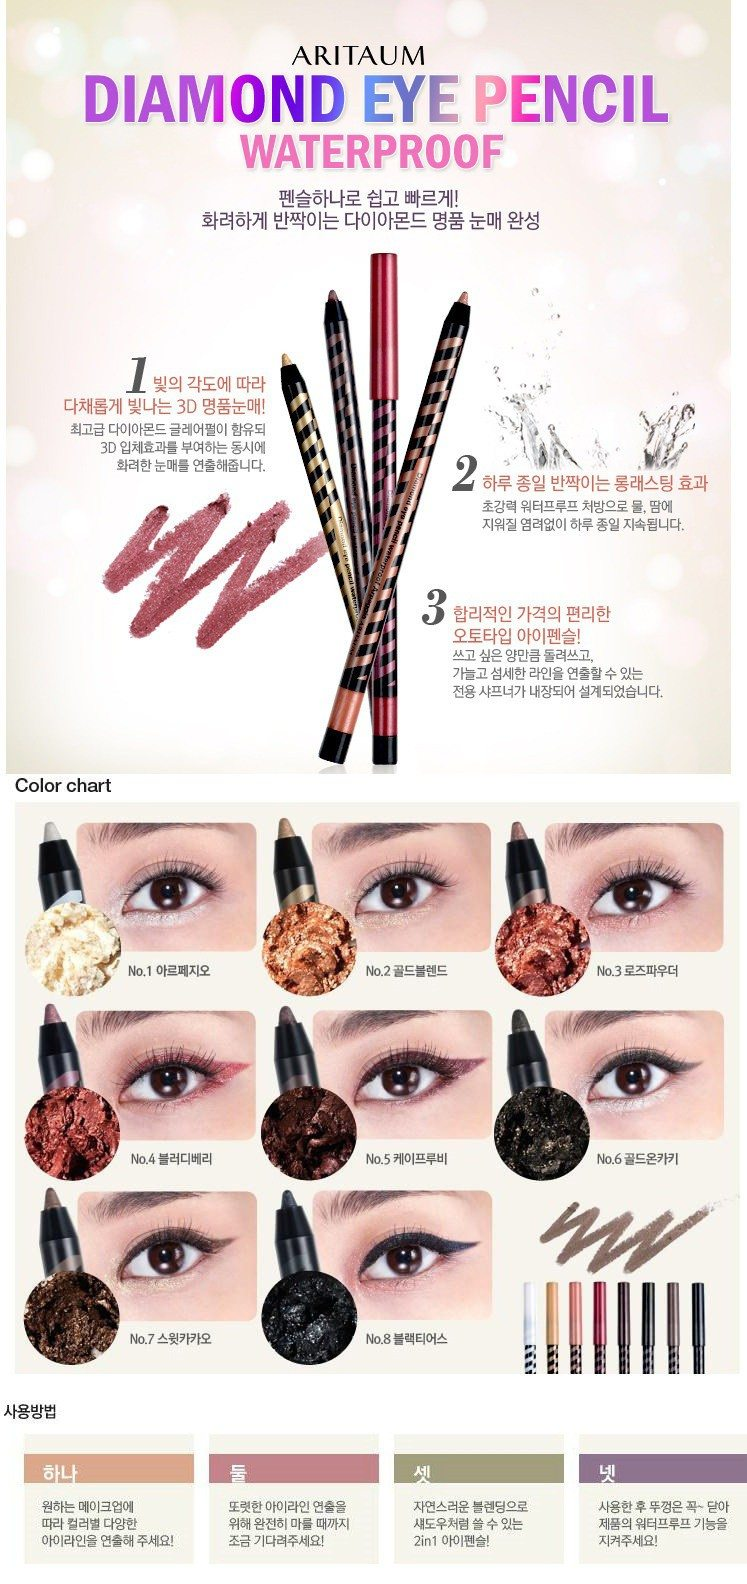 ARITAUM Diamond Eye Pencil Water Proof 0.5g